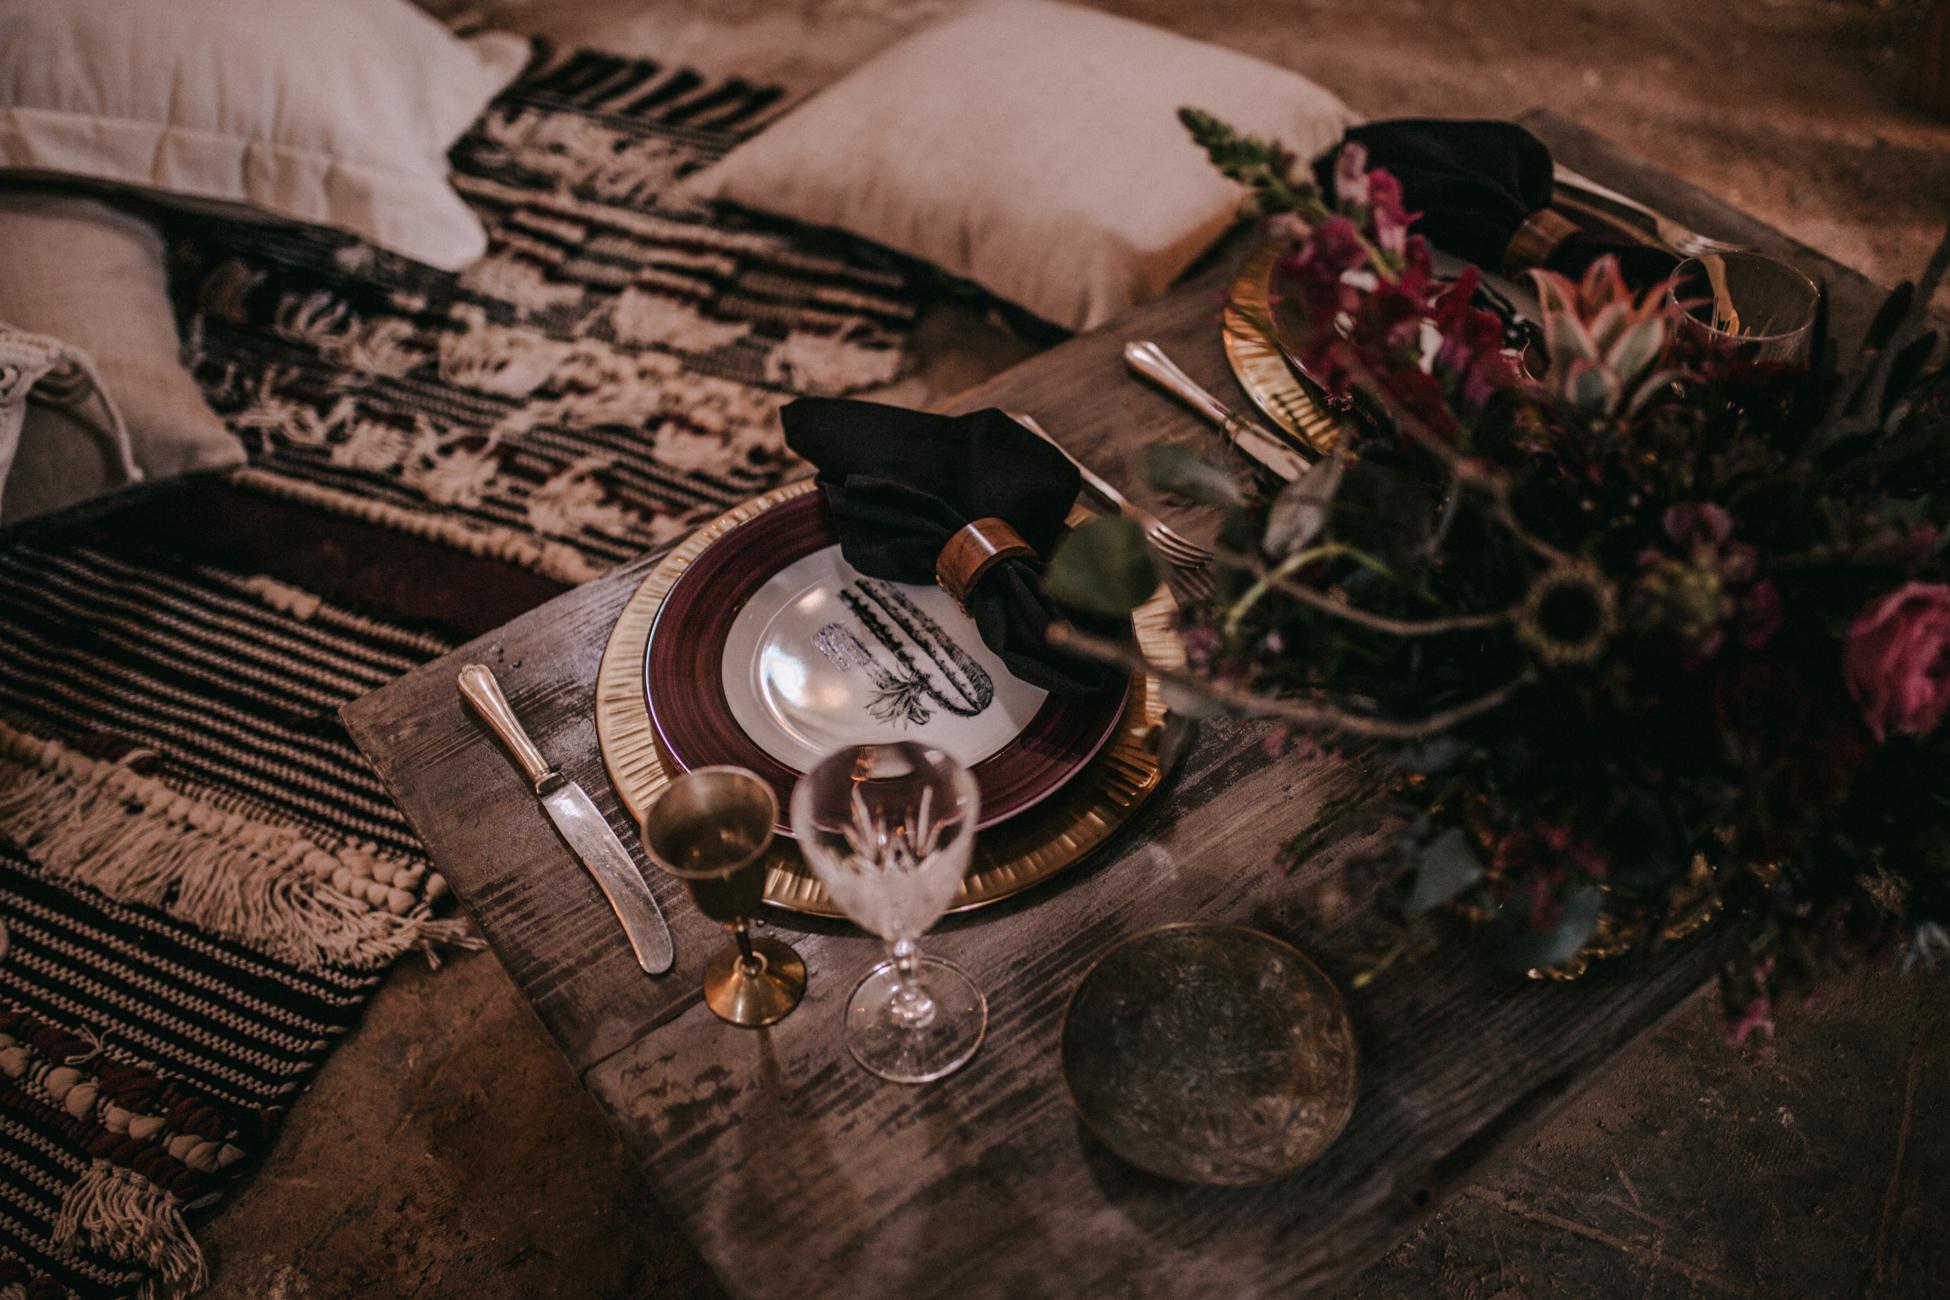 thenortherngirlphotography_photography_thenortherngirl_rebeccascabros_wedding_weddingphotography_weddingphotographer_wood_muebles_deco_bodasdecaramelo_home_bedtime_gaywedding_editorial_desierto_desert_wildestdreams_amortexano-2.jpg